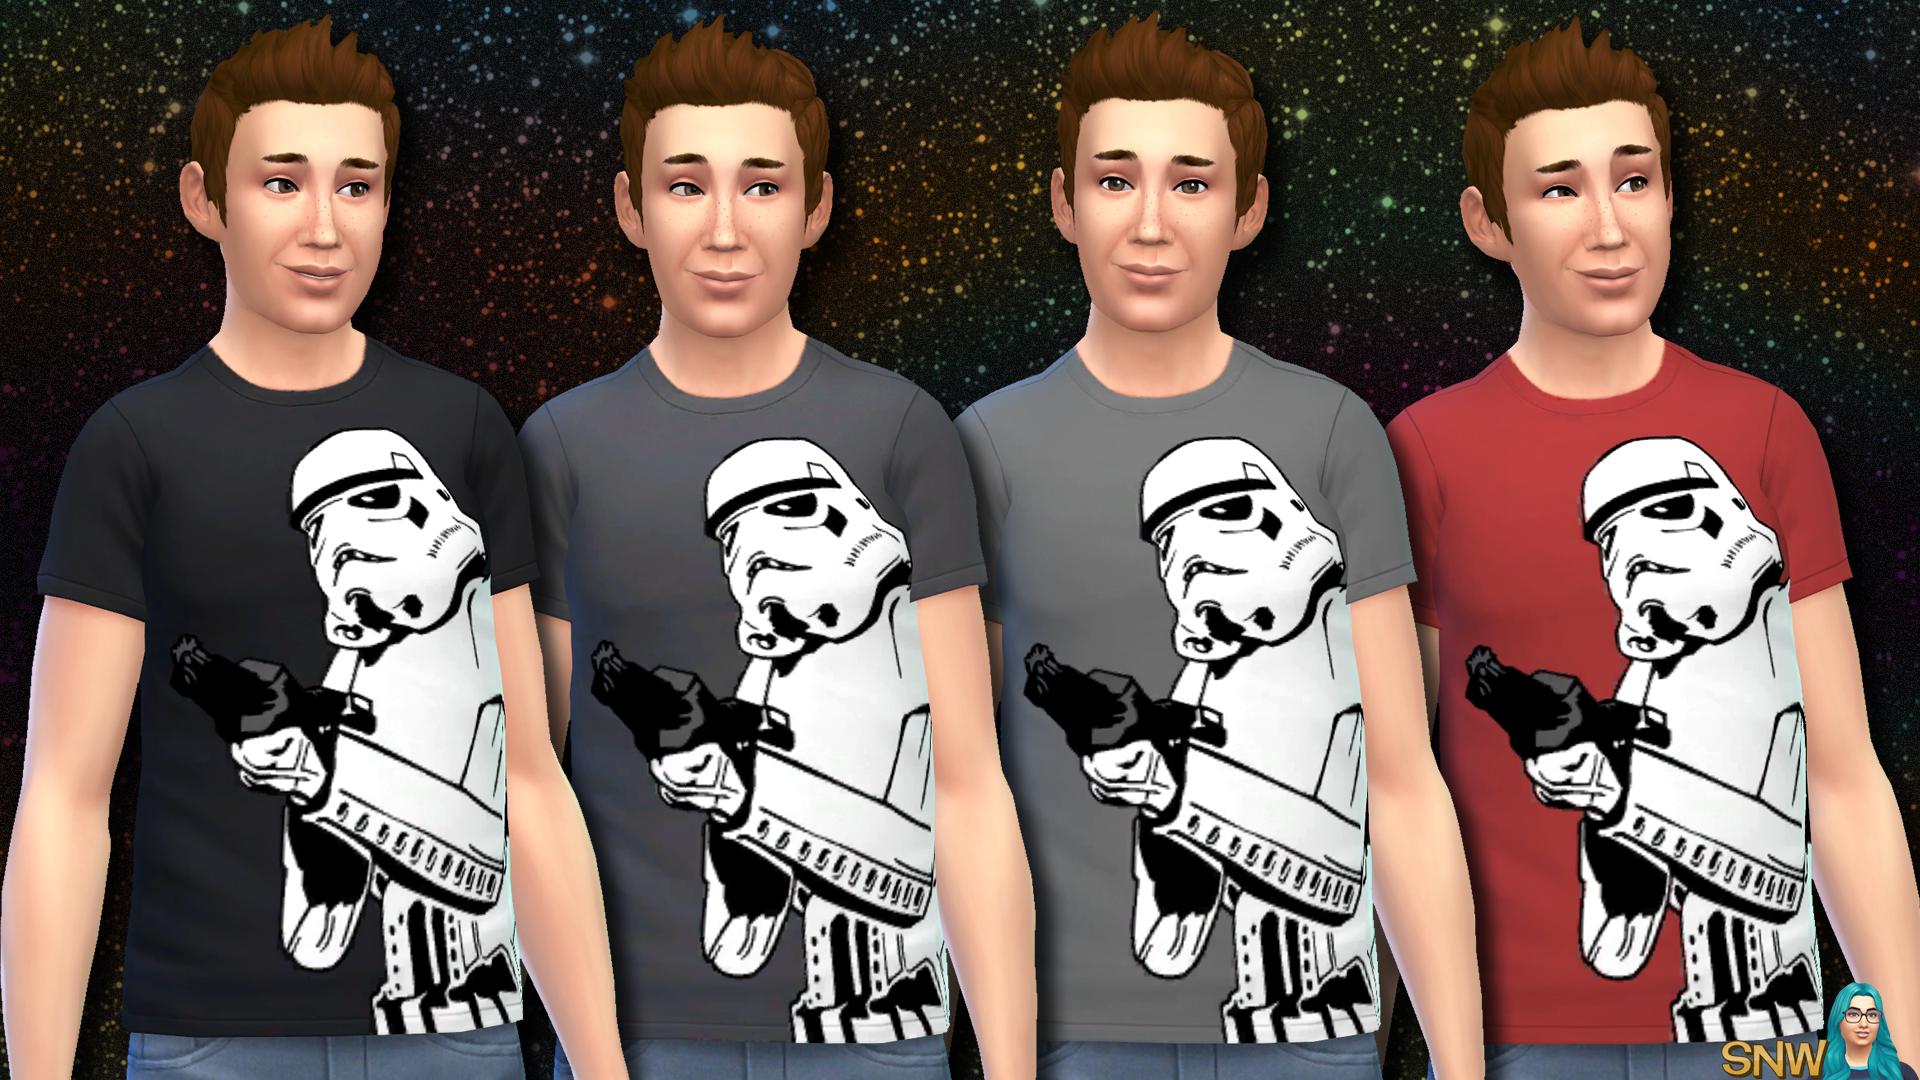 Star Wars Stormtrooper Shirts for Men